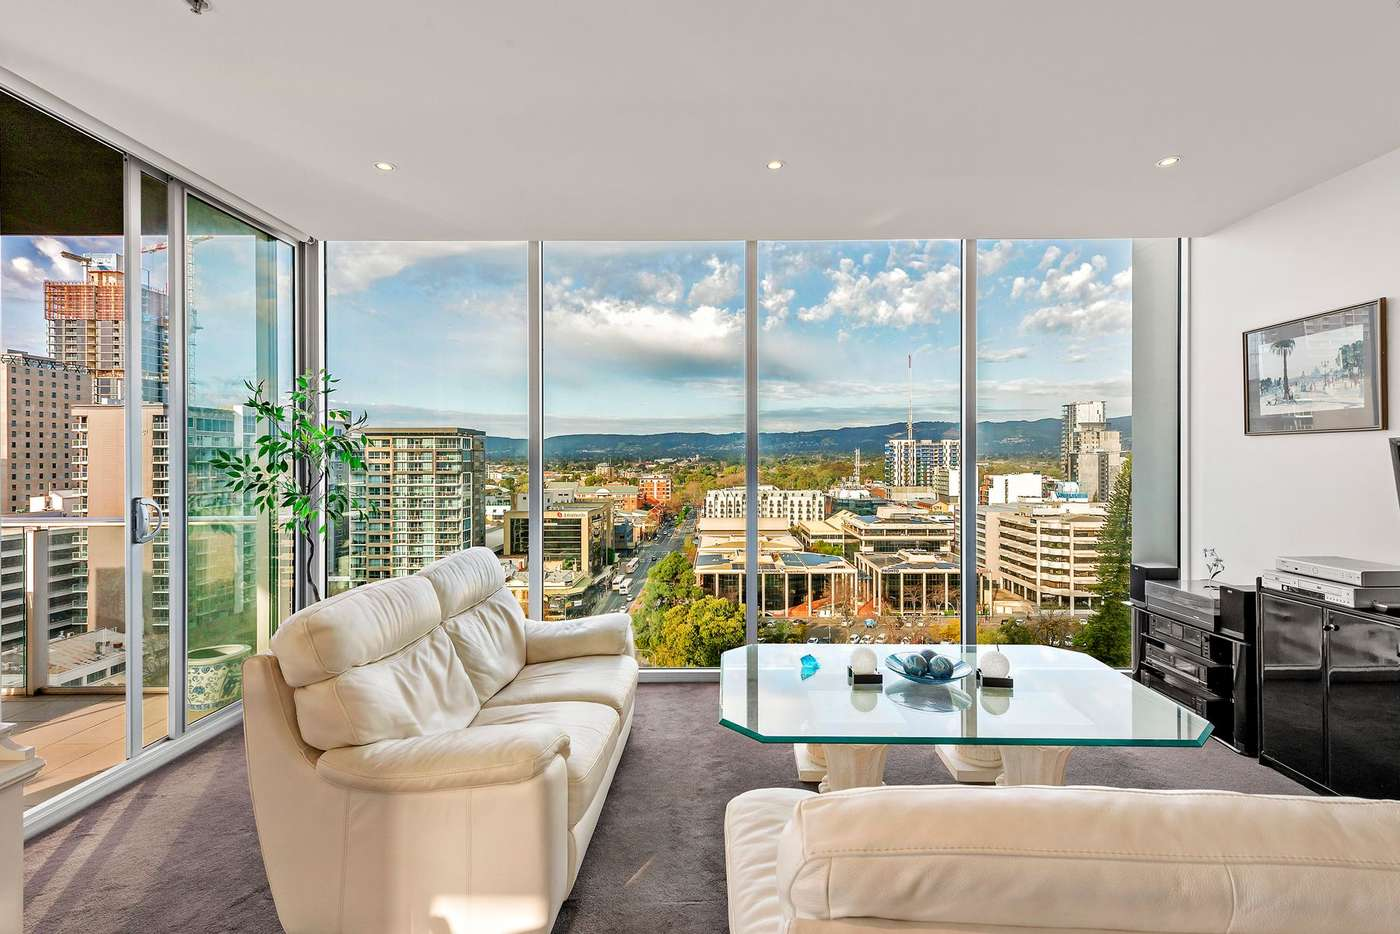 Main view of Homely apartment listing, 1201/47 Hindmarsh Square, Adelaide SA 5000